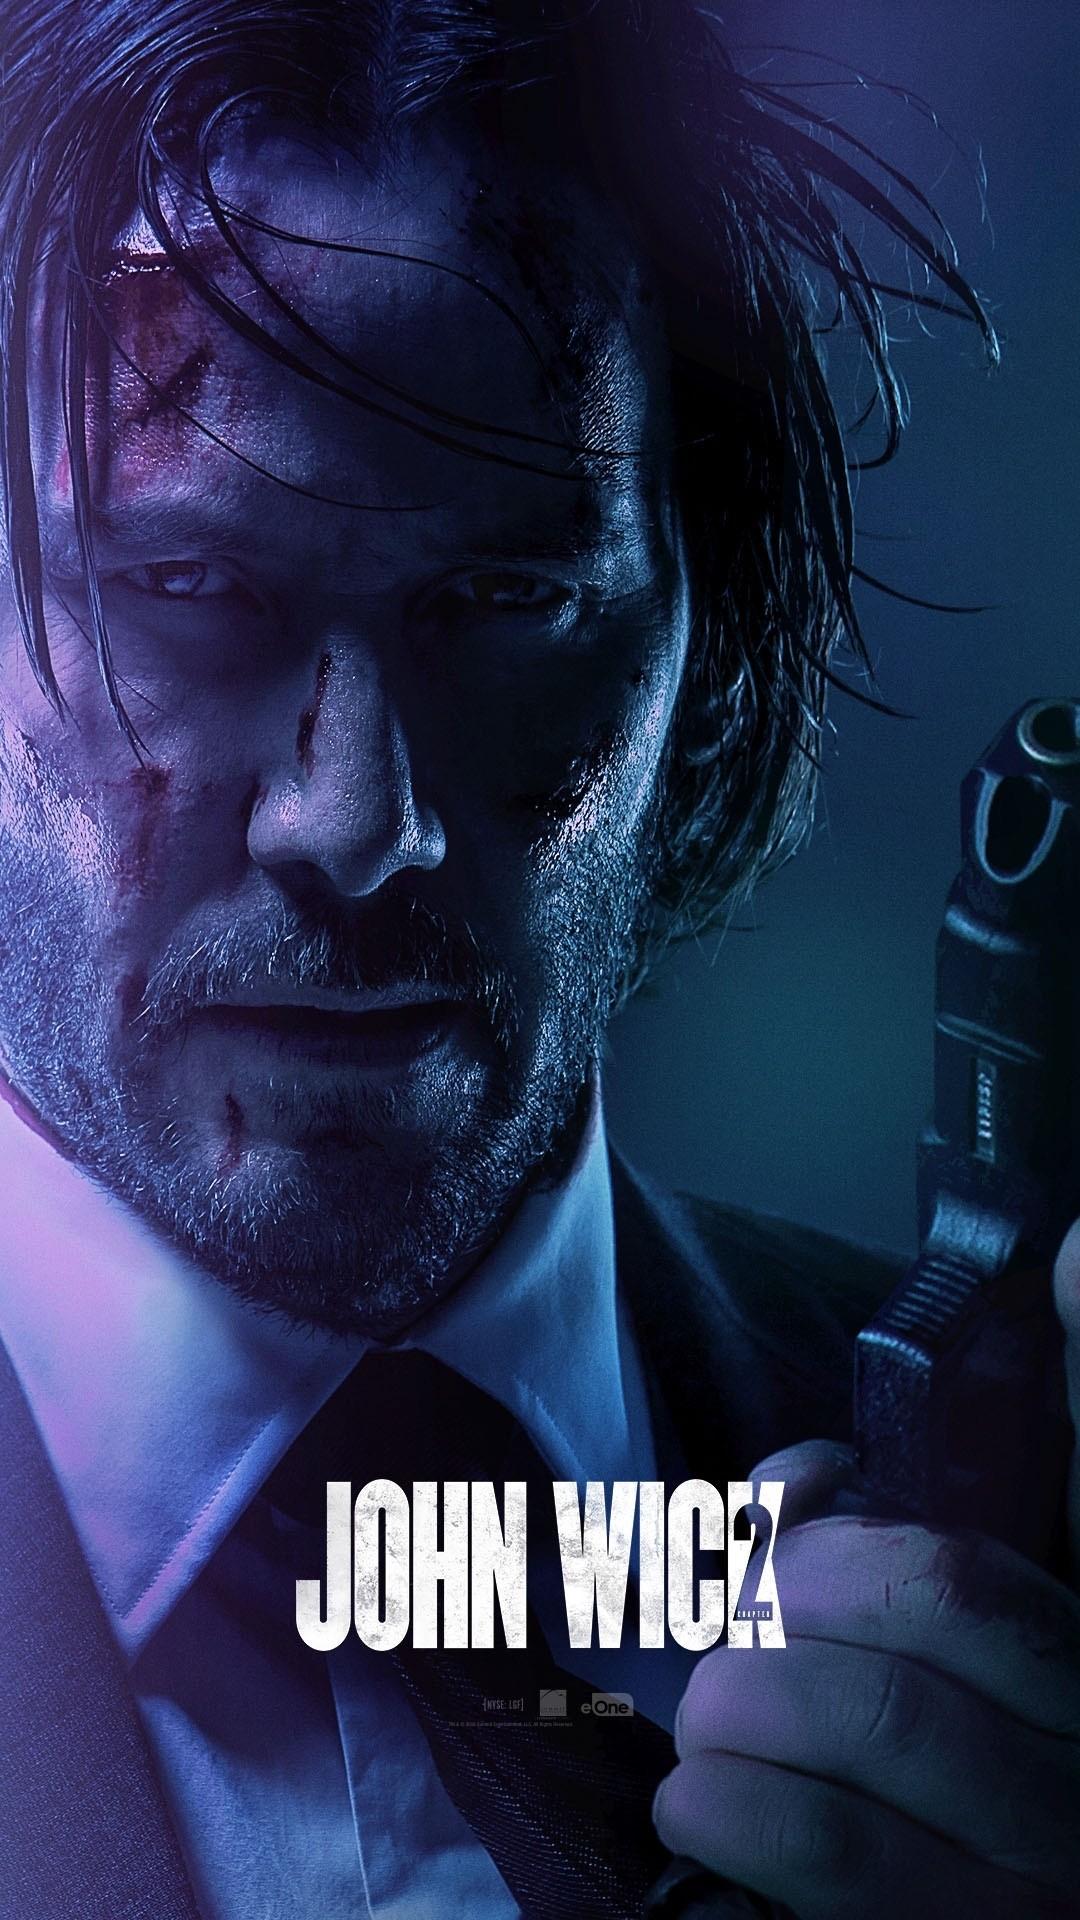 John Wick phone background